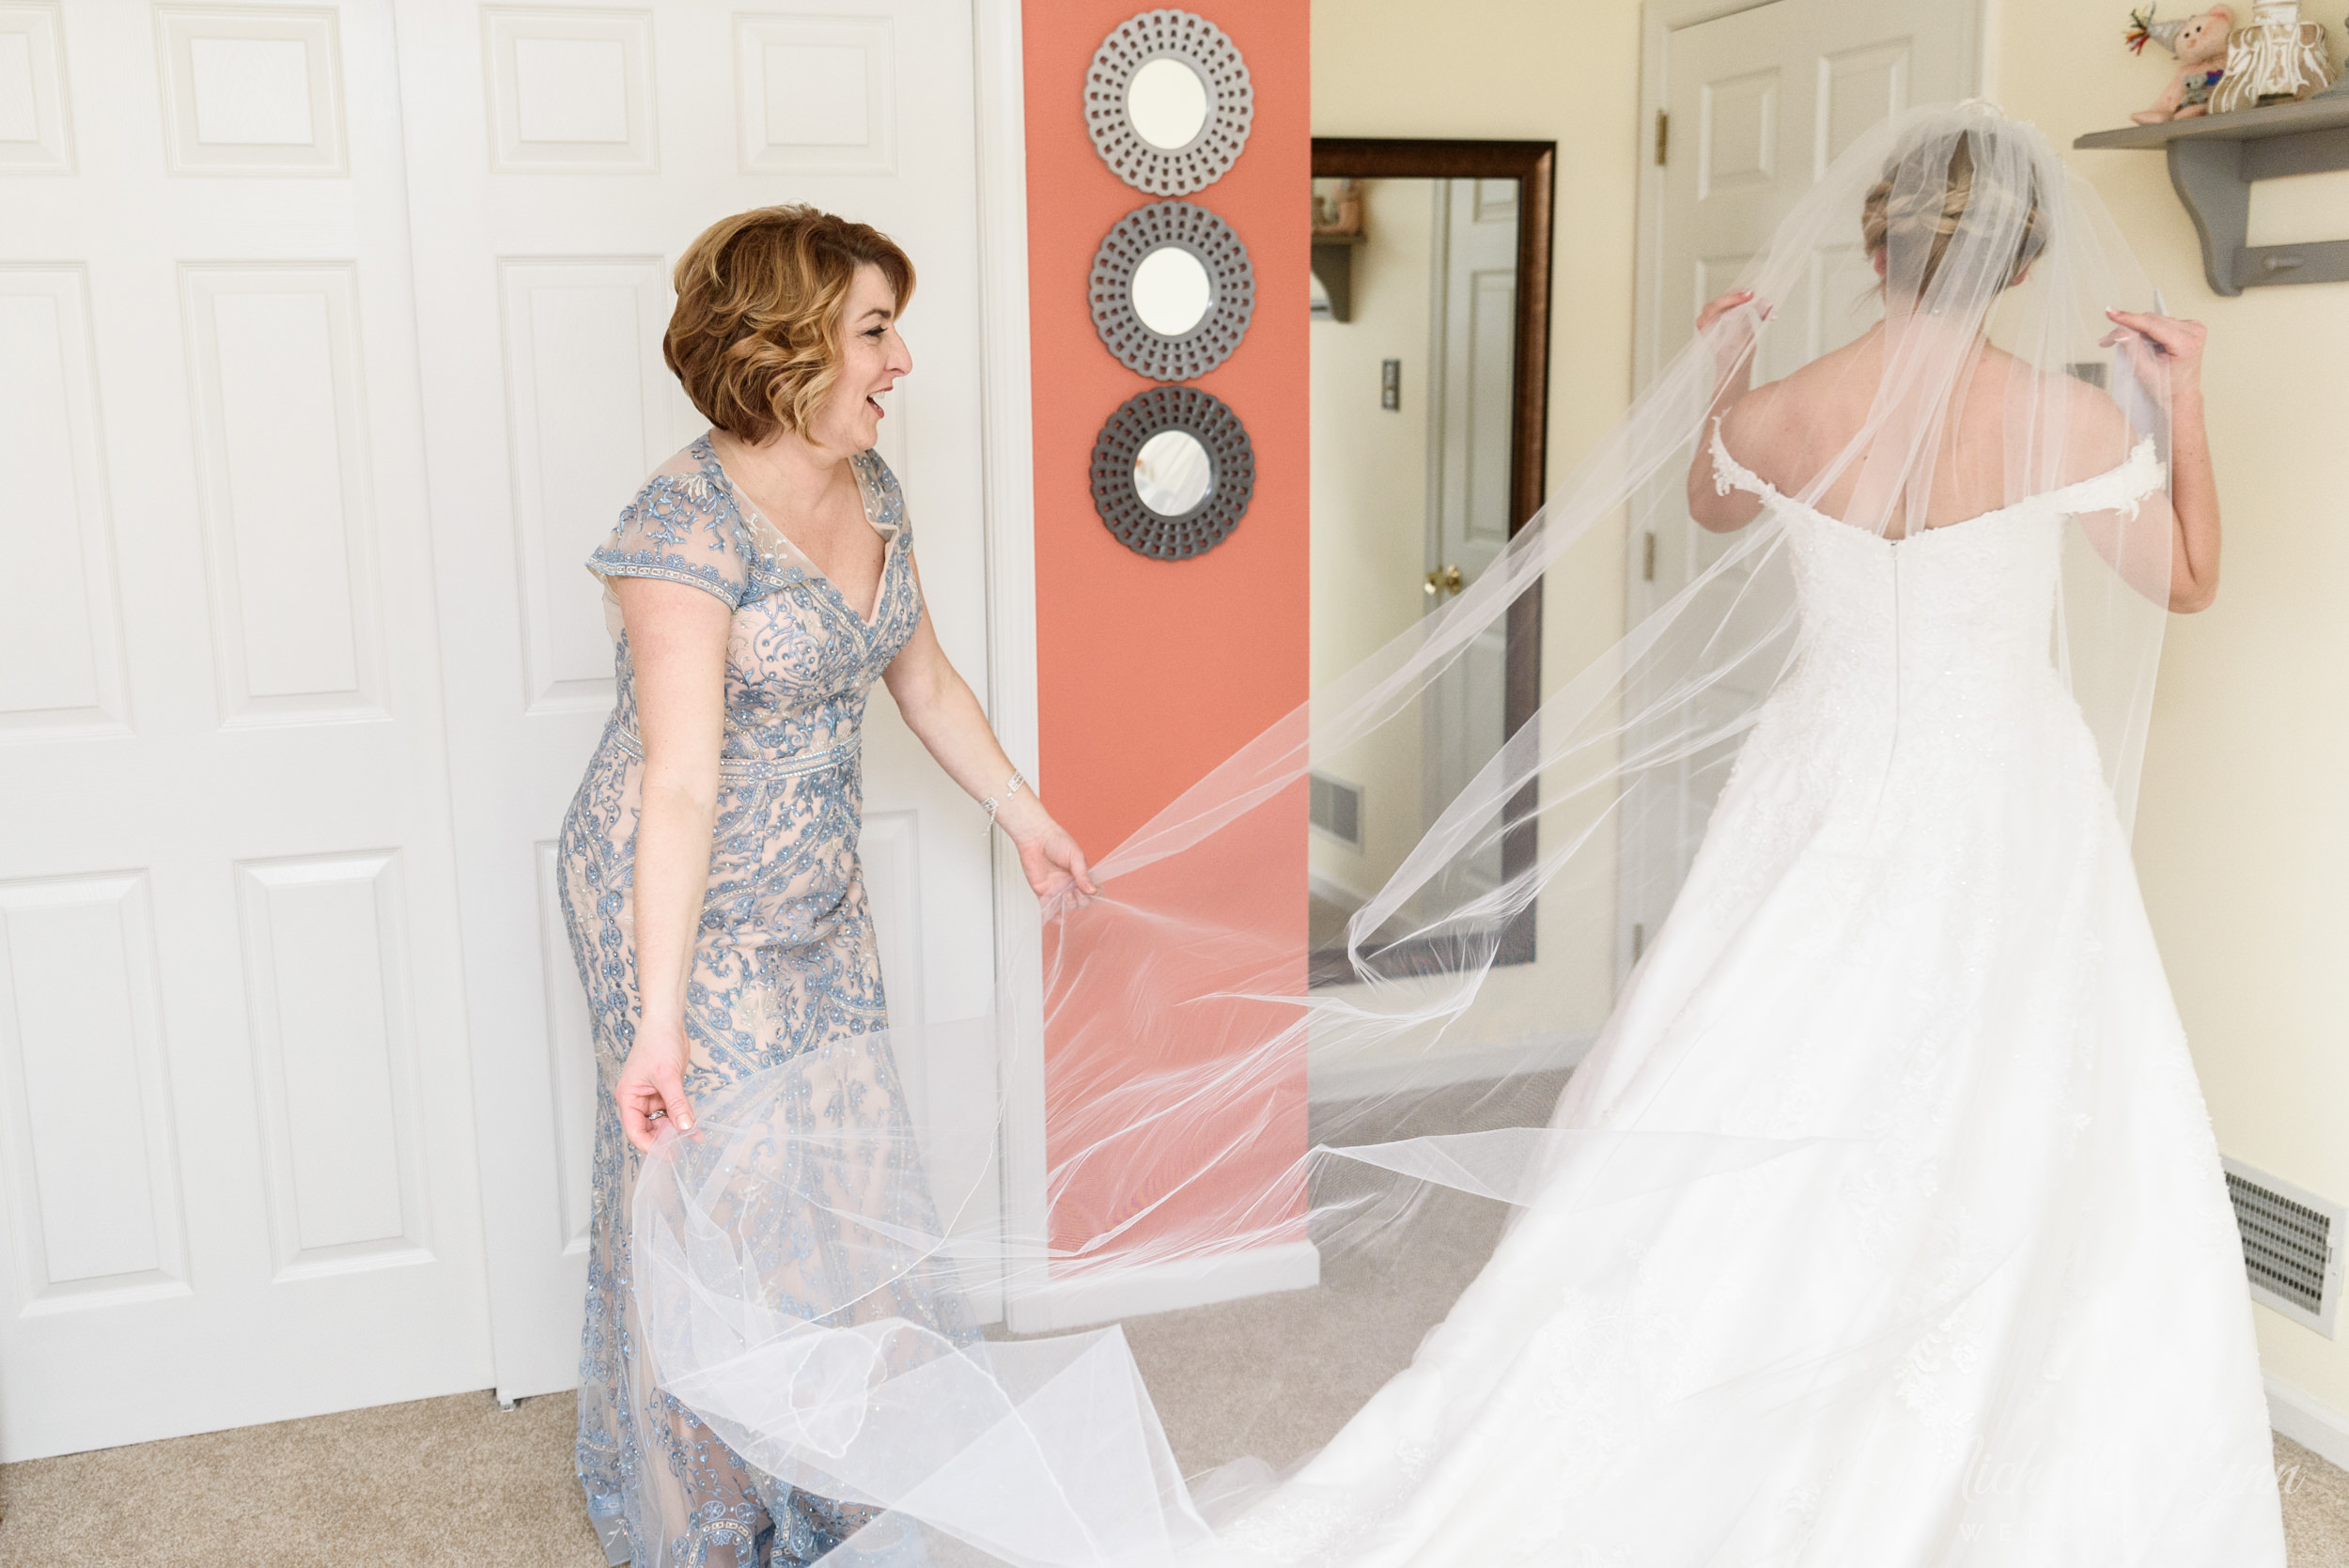 william-penn-inn-wedding-photography-mlw-17.jpg